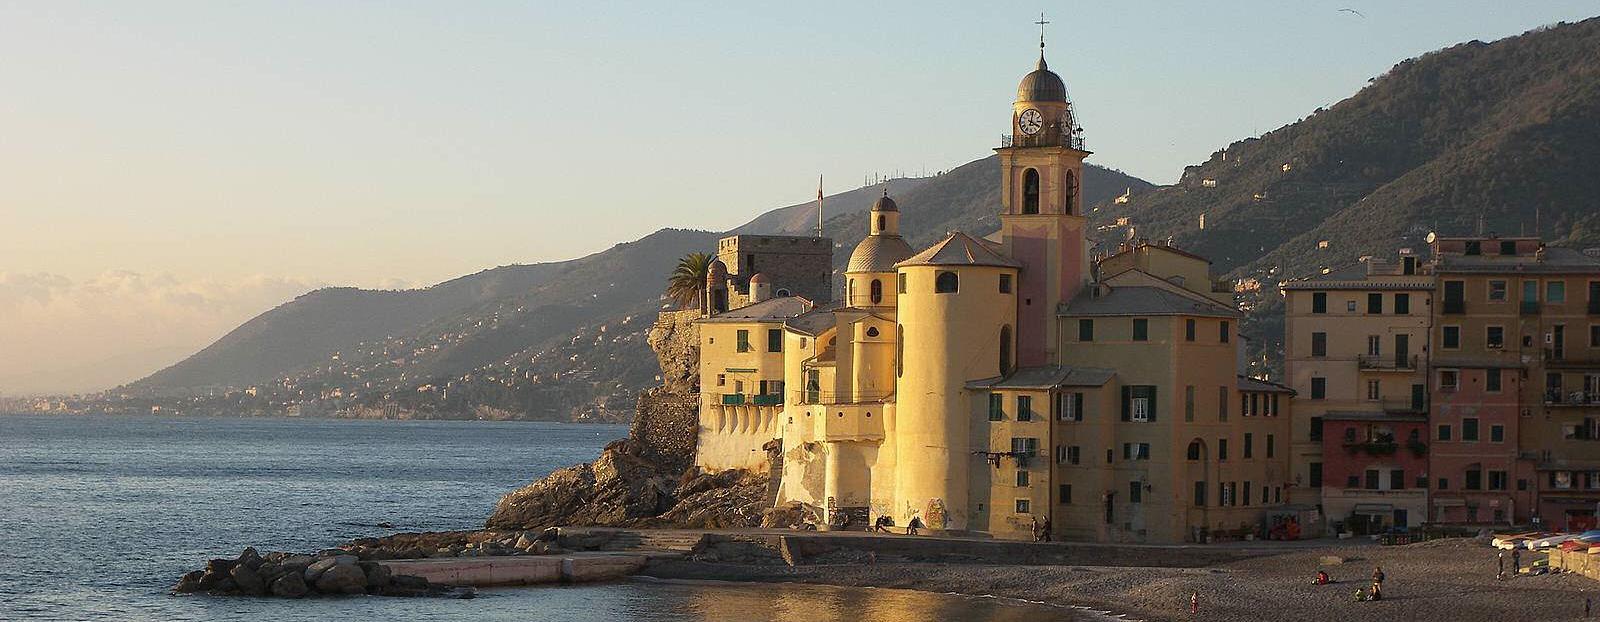 Camogli-church-Liguria-beach1